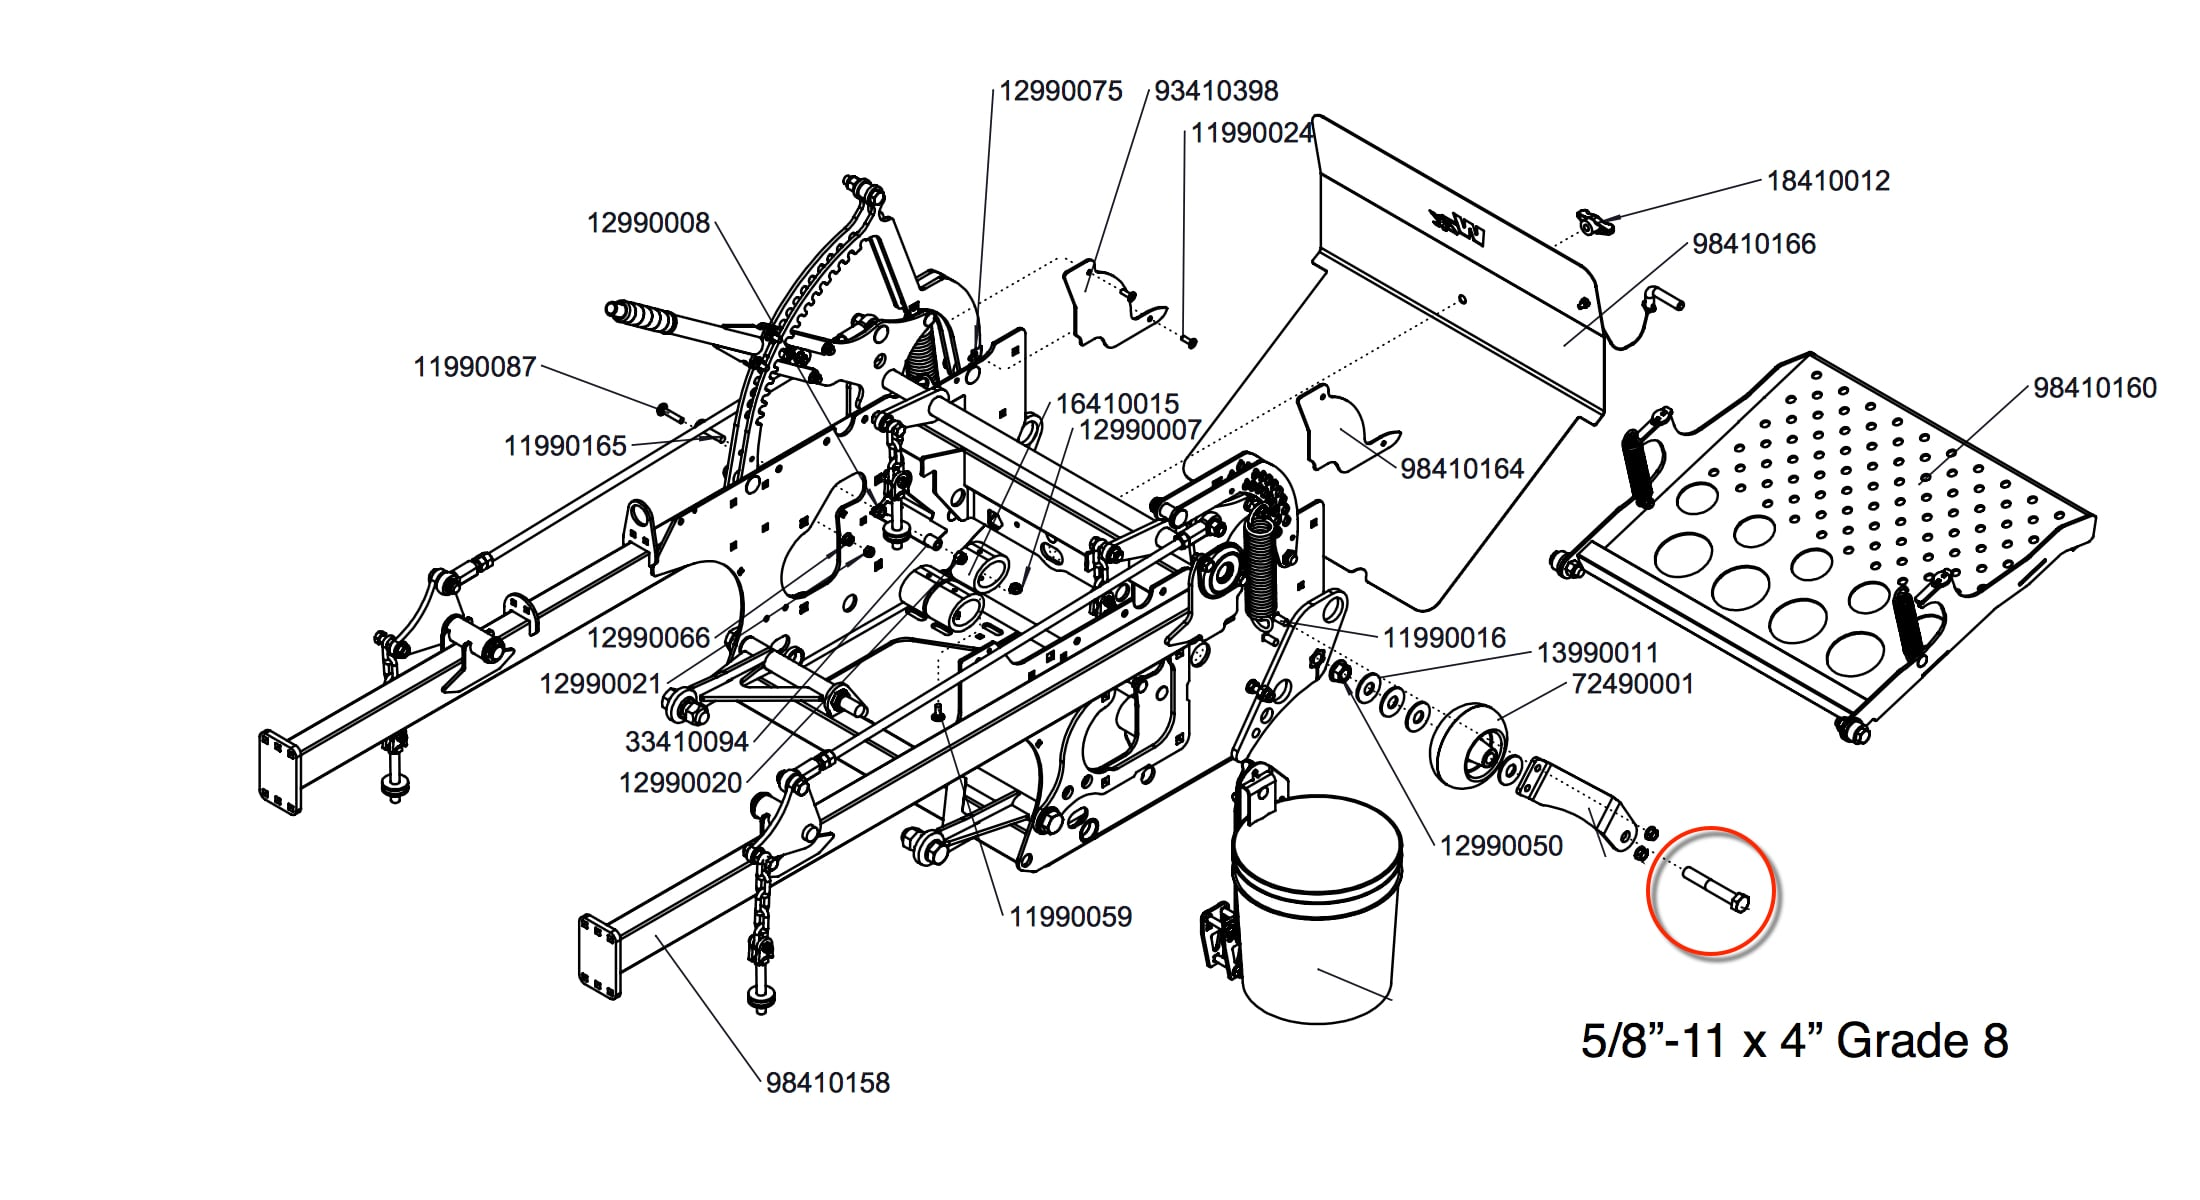 Wright Stander Mower Wiring Diagram